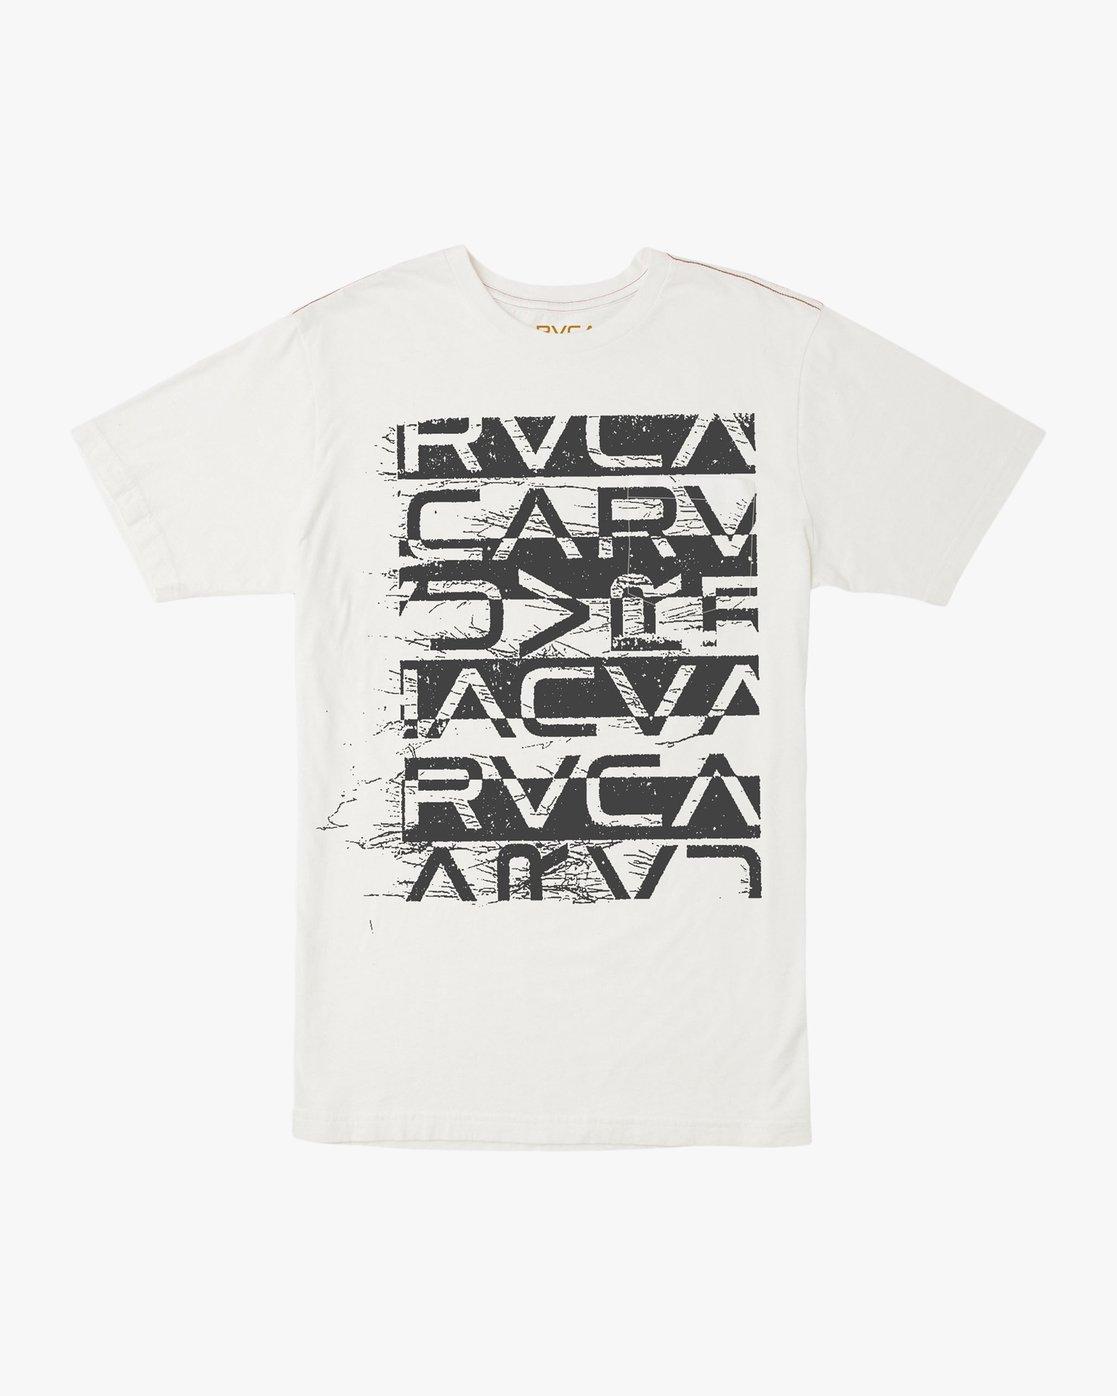 0 Staxt T-Shirt White M436TRST RVCA